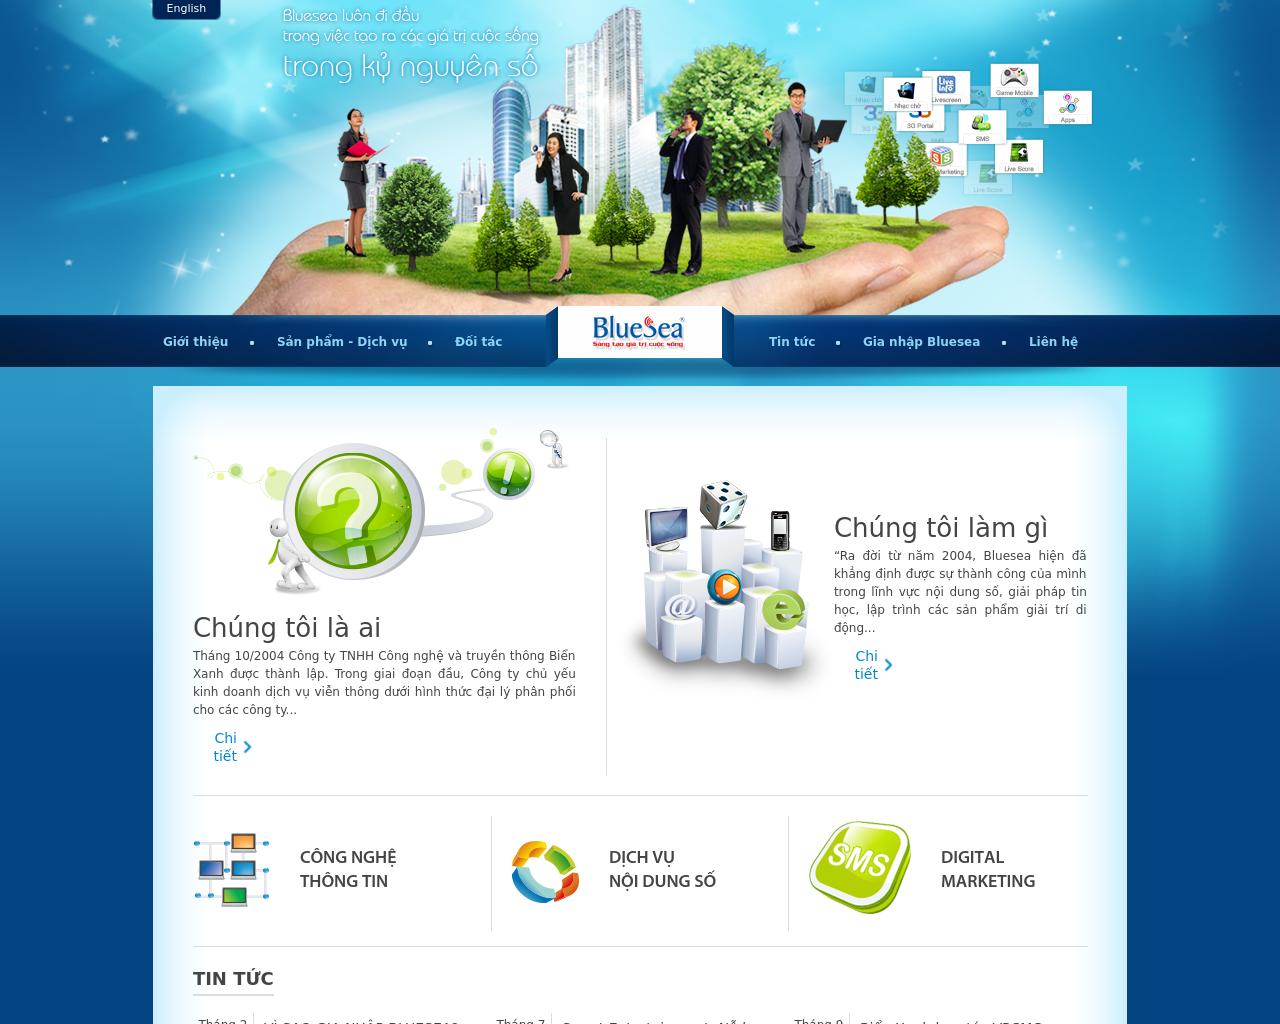 BlueSea-Advertising-Reviews-Pricing